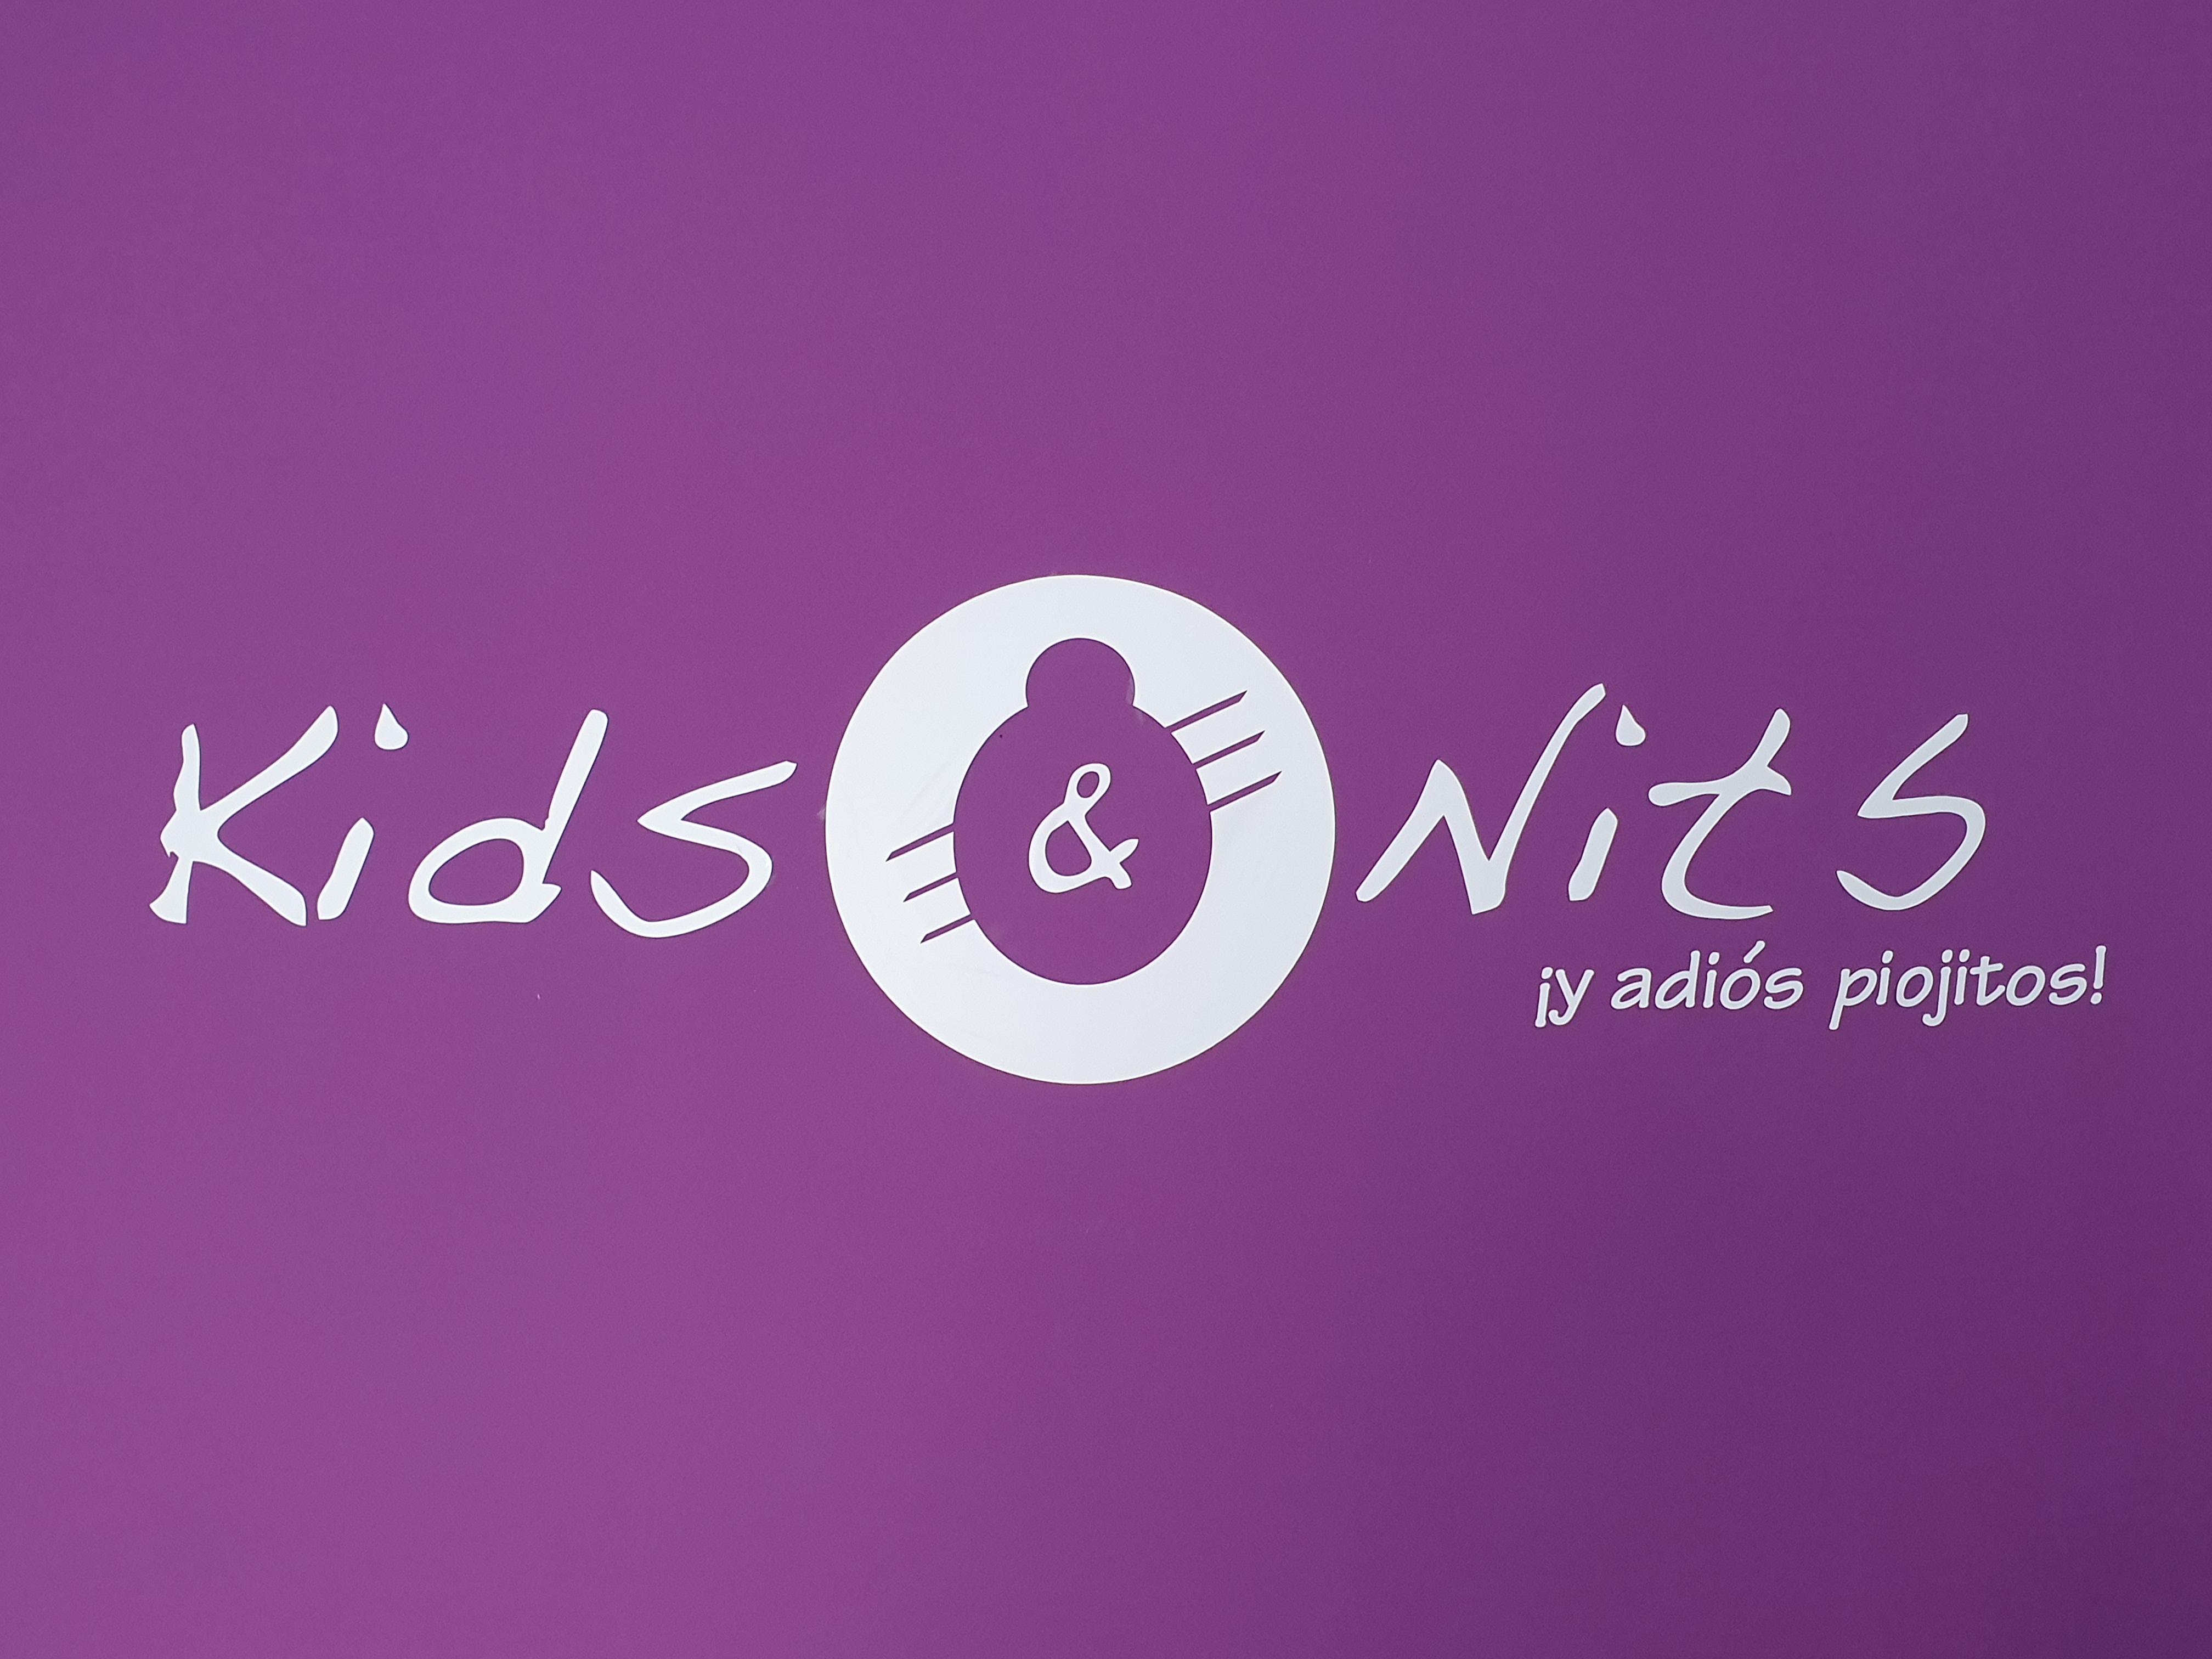 Kids & Nits Cáceres